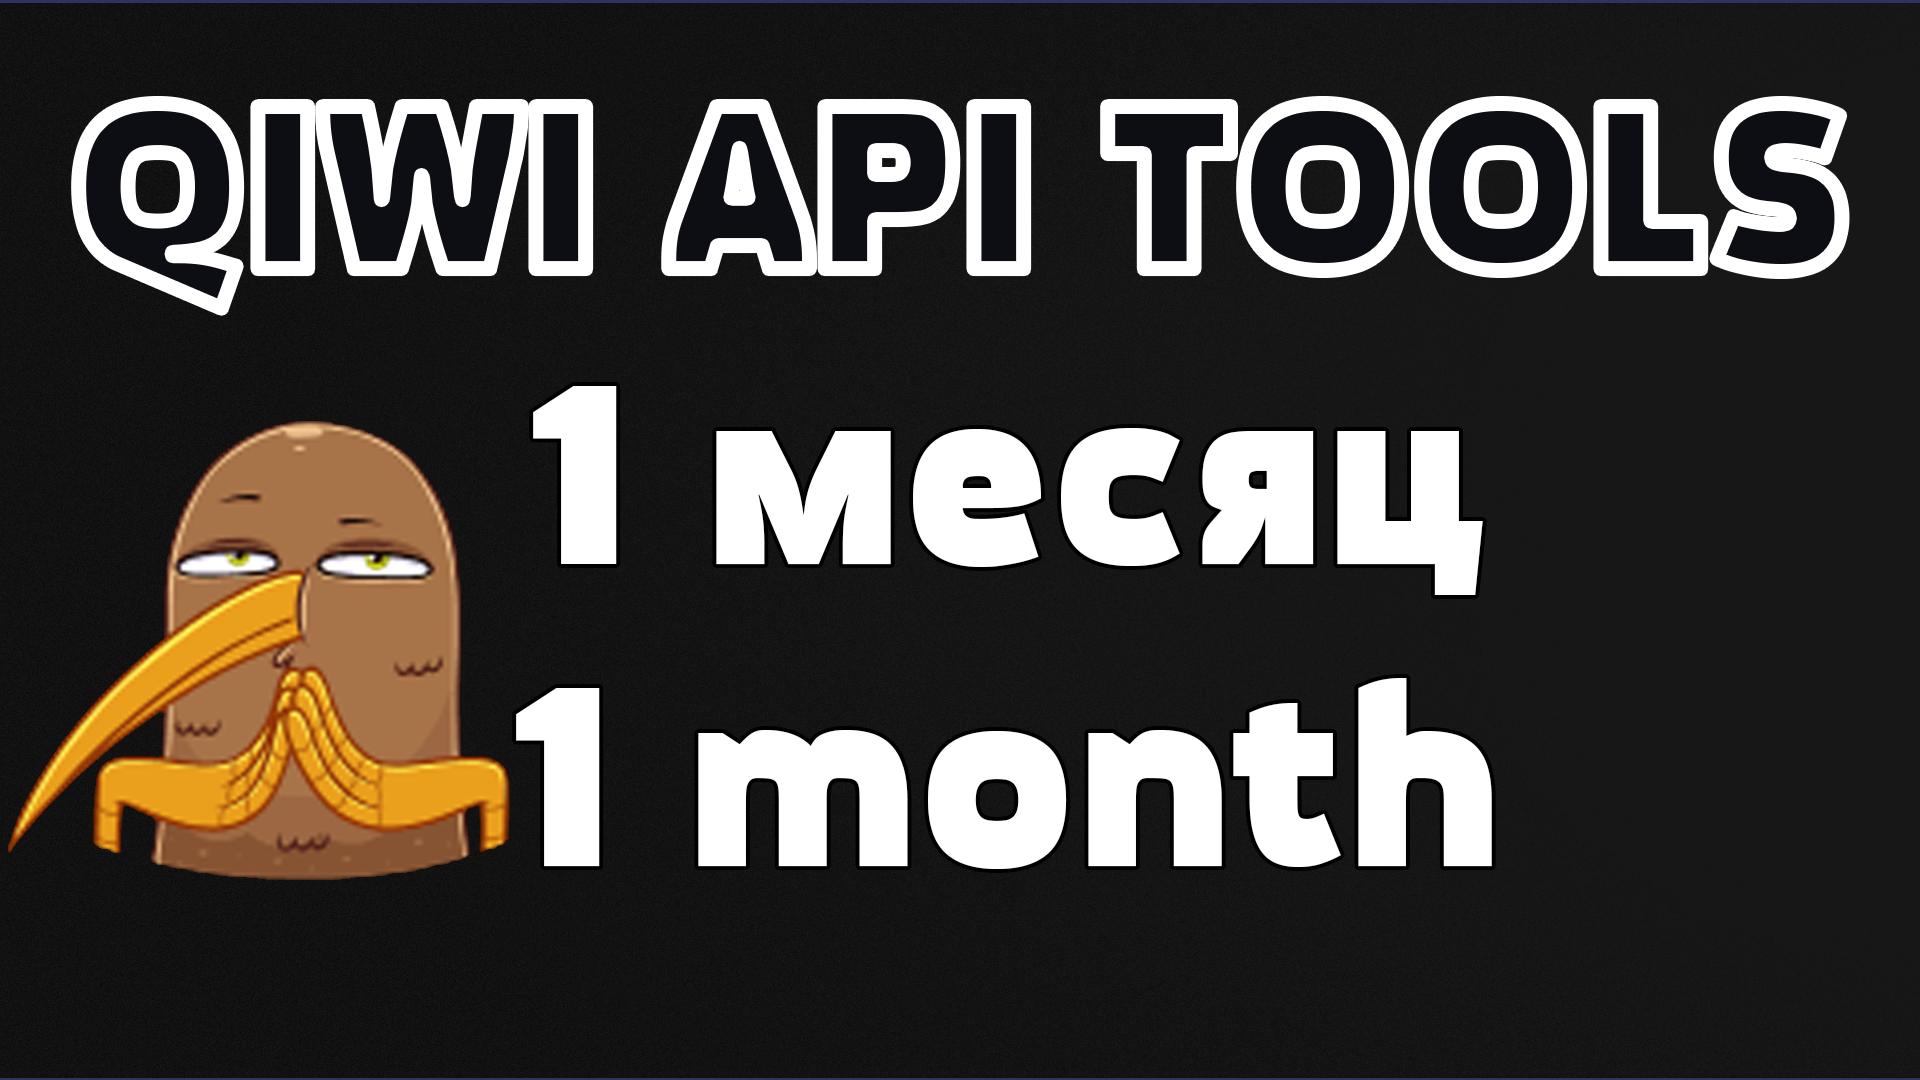 QIWI API TOOLS 1 месяц